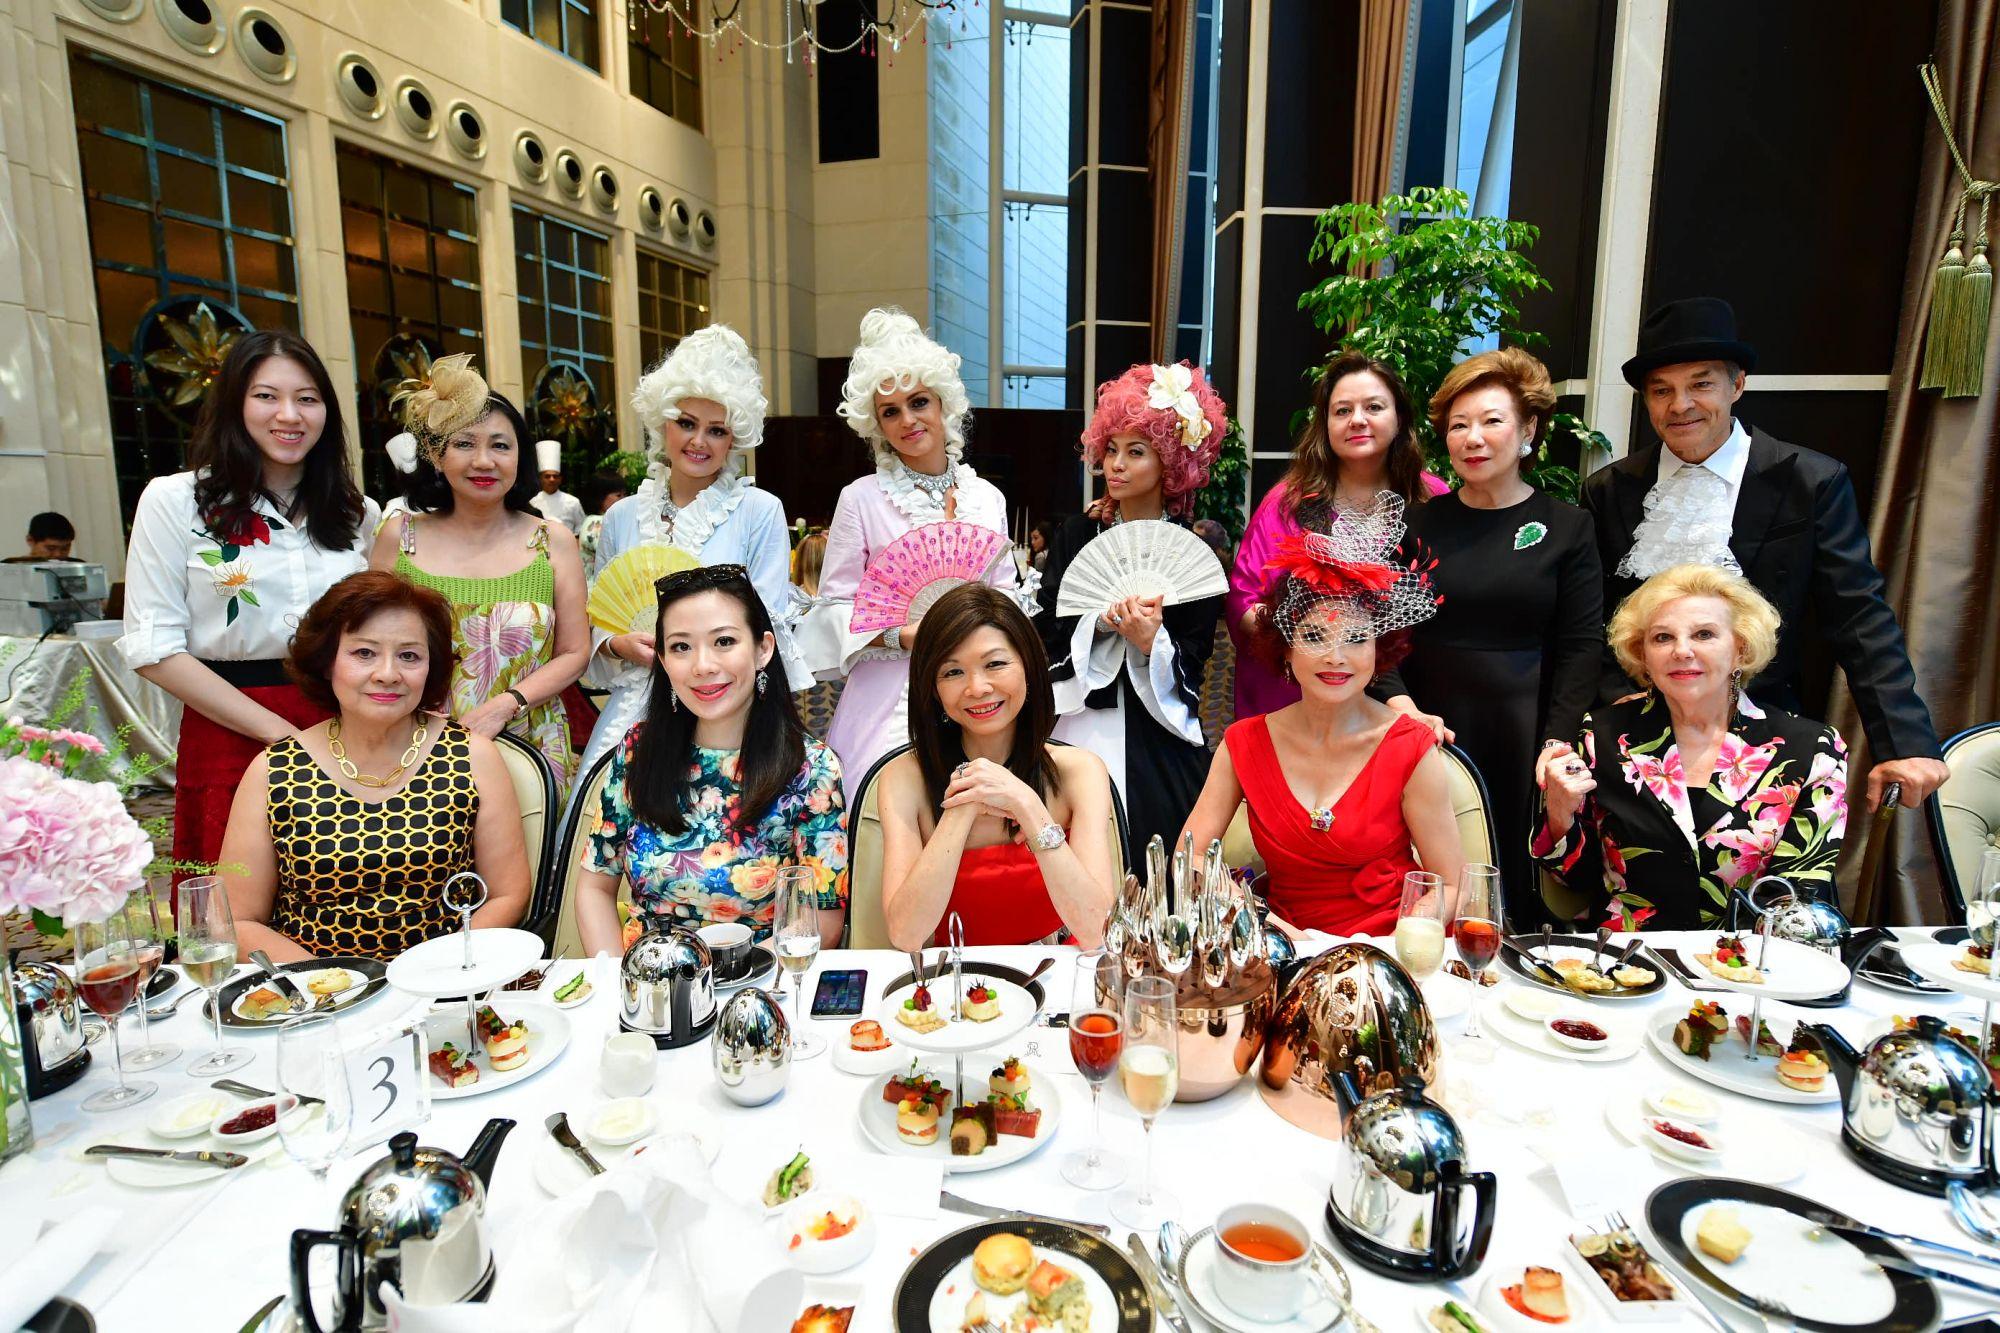 (Clockwise from top left) Zeena Tan, Renee Tan, Elena Iwatake, Jessie Lee, Gerti Iwatake, Linda Soo-Tan, Stephanie Lee, Irene Choo